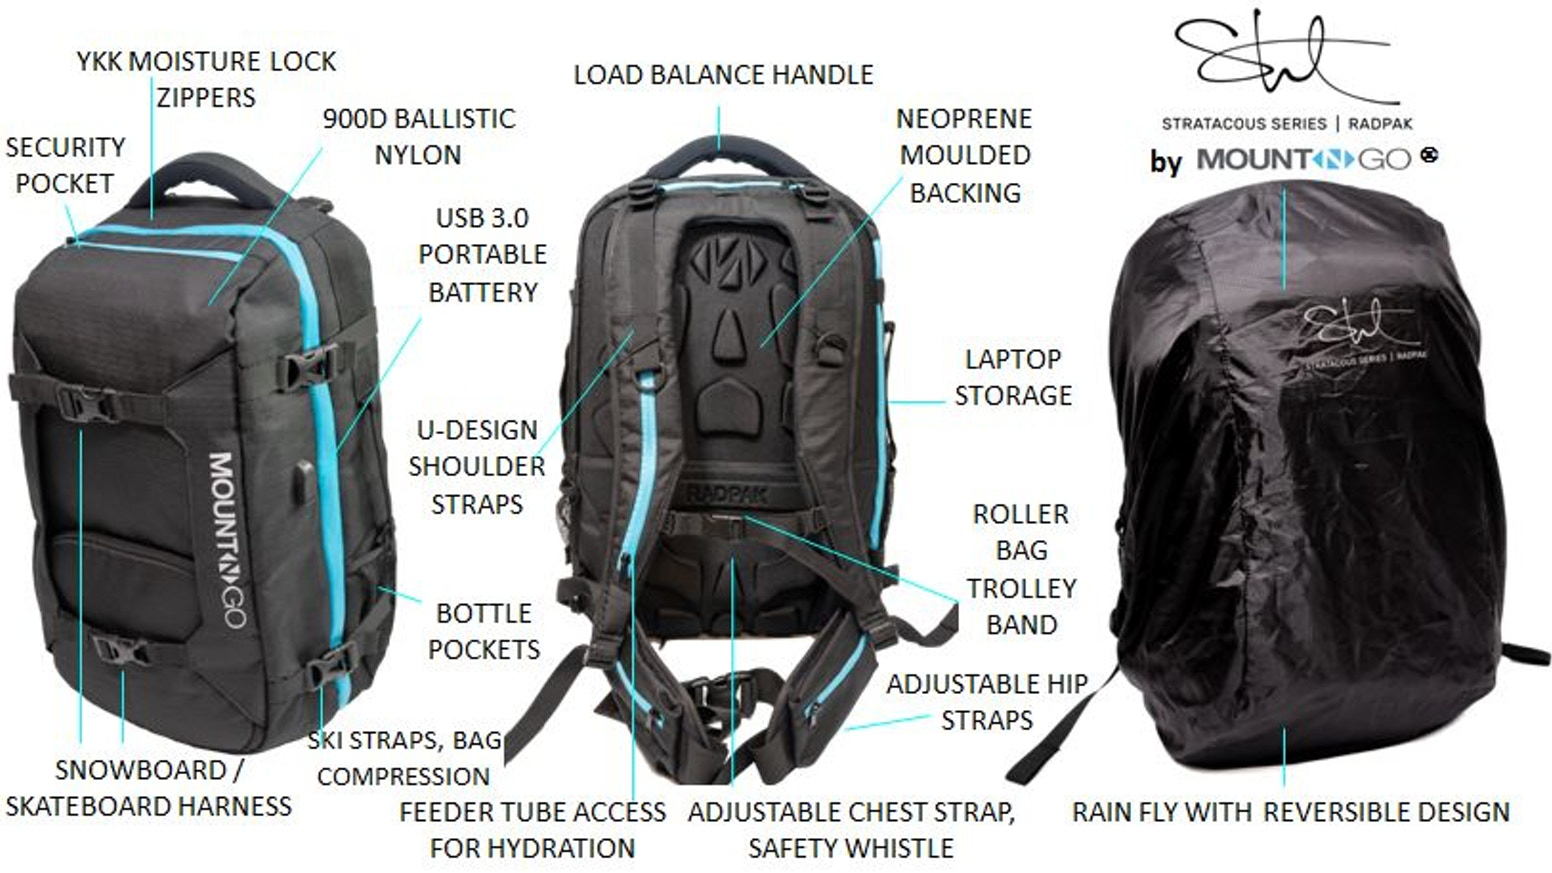 9003f1b0a5b5 The Stratacous Series RADPAK Backpack by Strat Streetman — Kickstarter